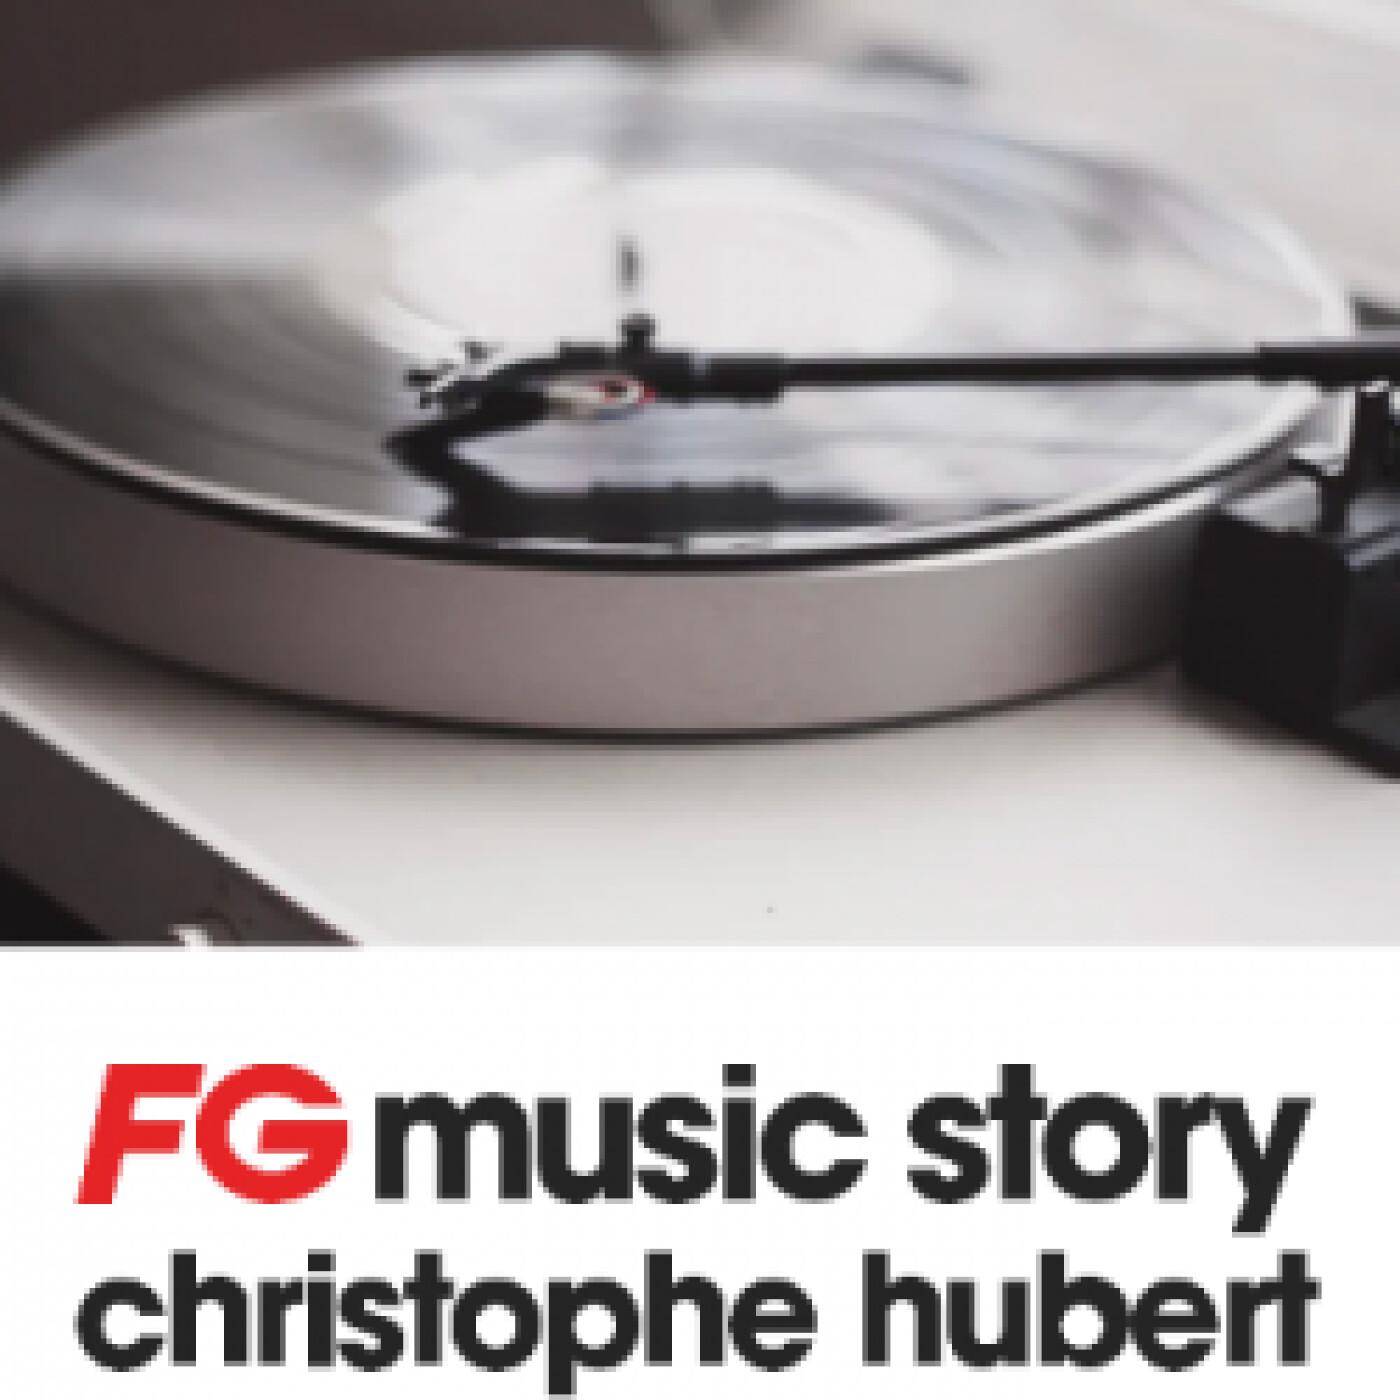 FG MUSIC STORY : MEMORIES